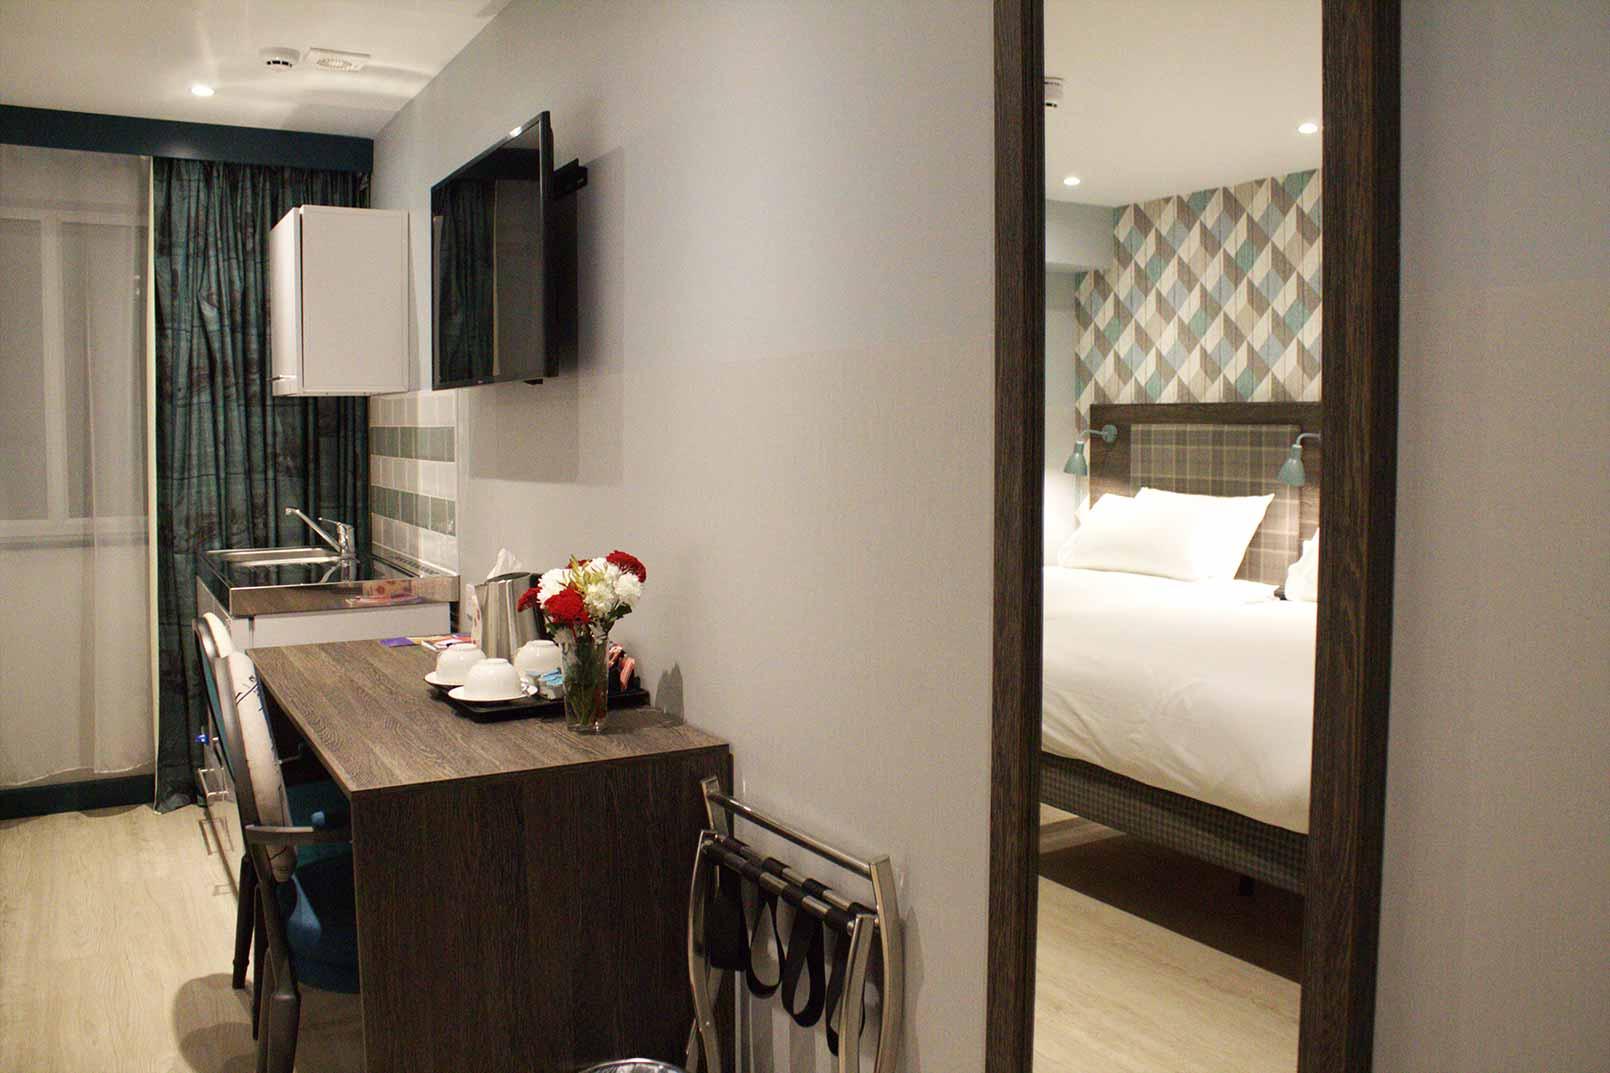 Best Western Hotel Croydon